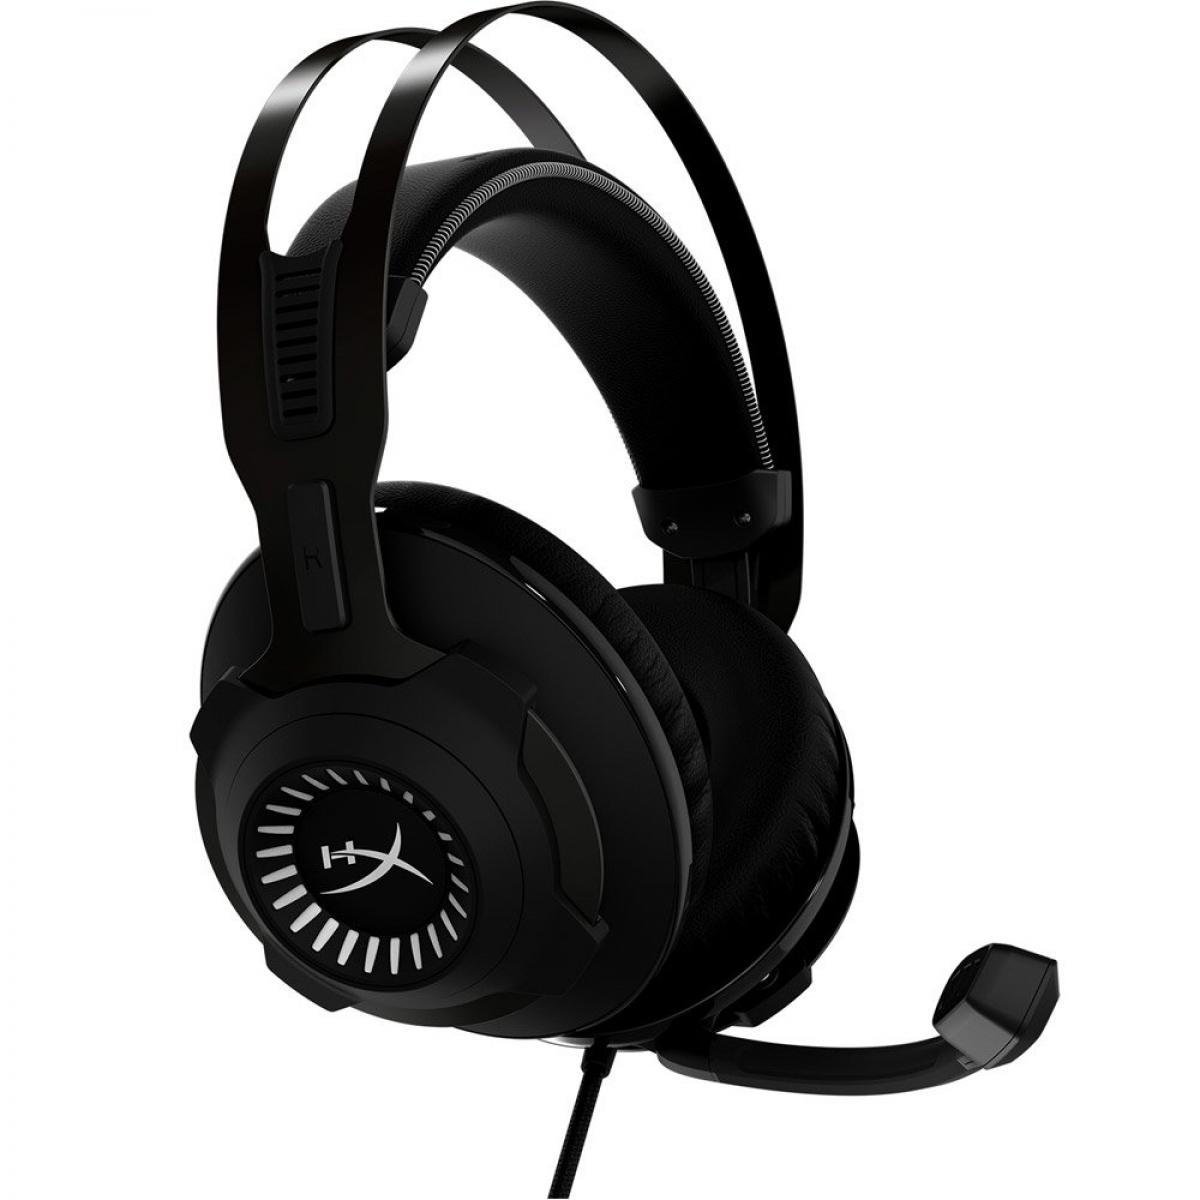 Headset Gamer HyperX Revolver S HX-HSCRS-GM/LA 7.1 Dolby Digital